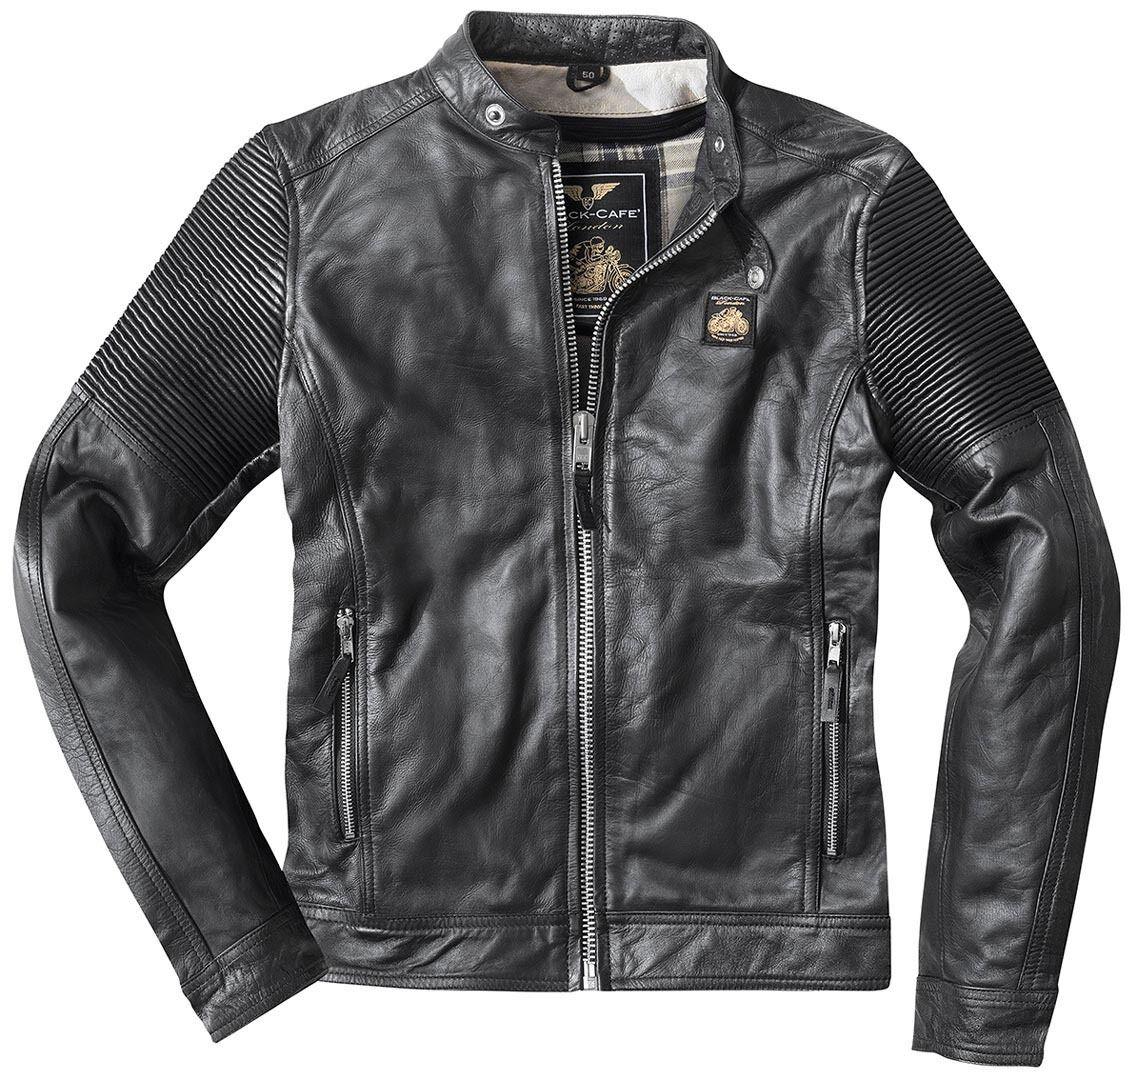 Black-Cafe London Milano Veste en cuir de moto Noir taille : 48